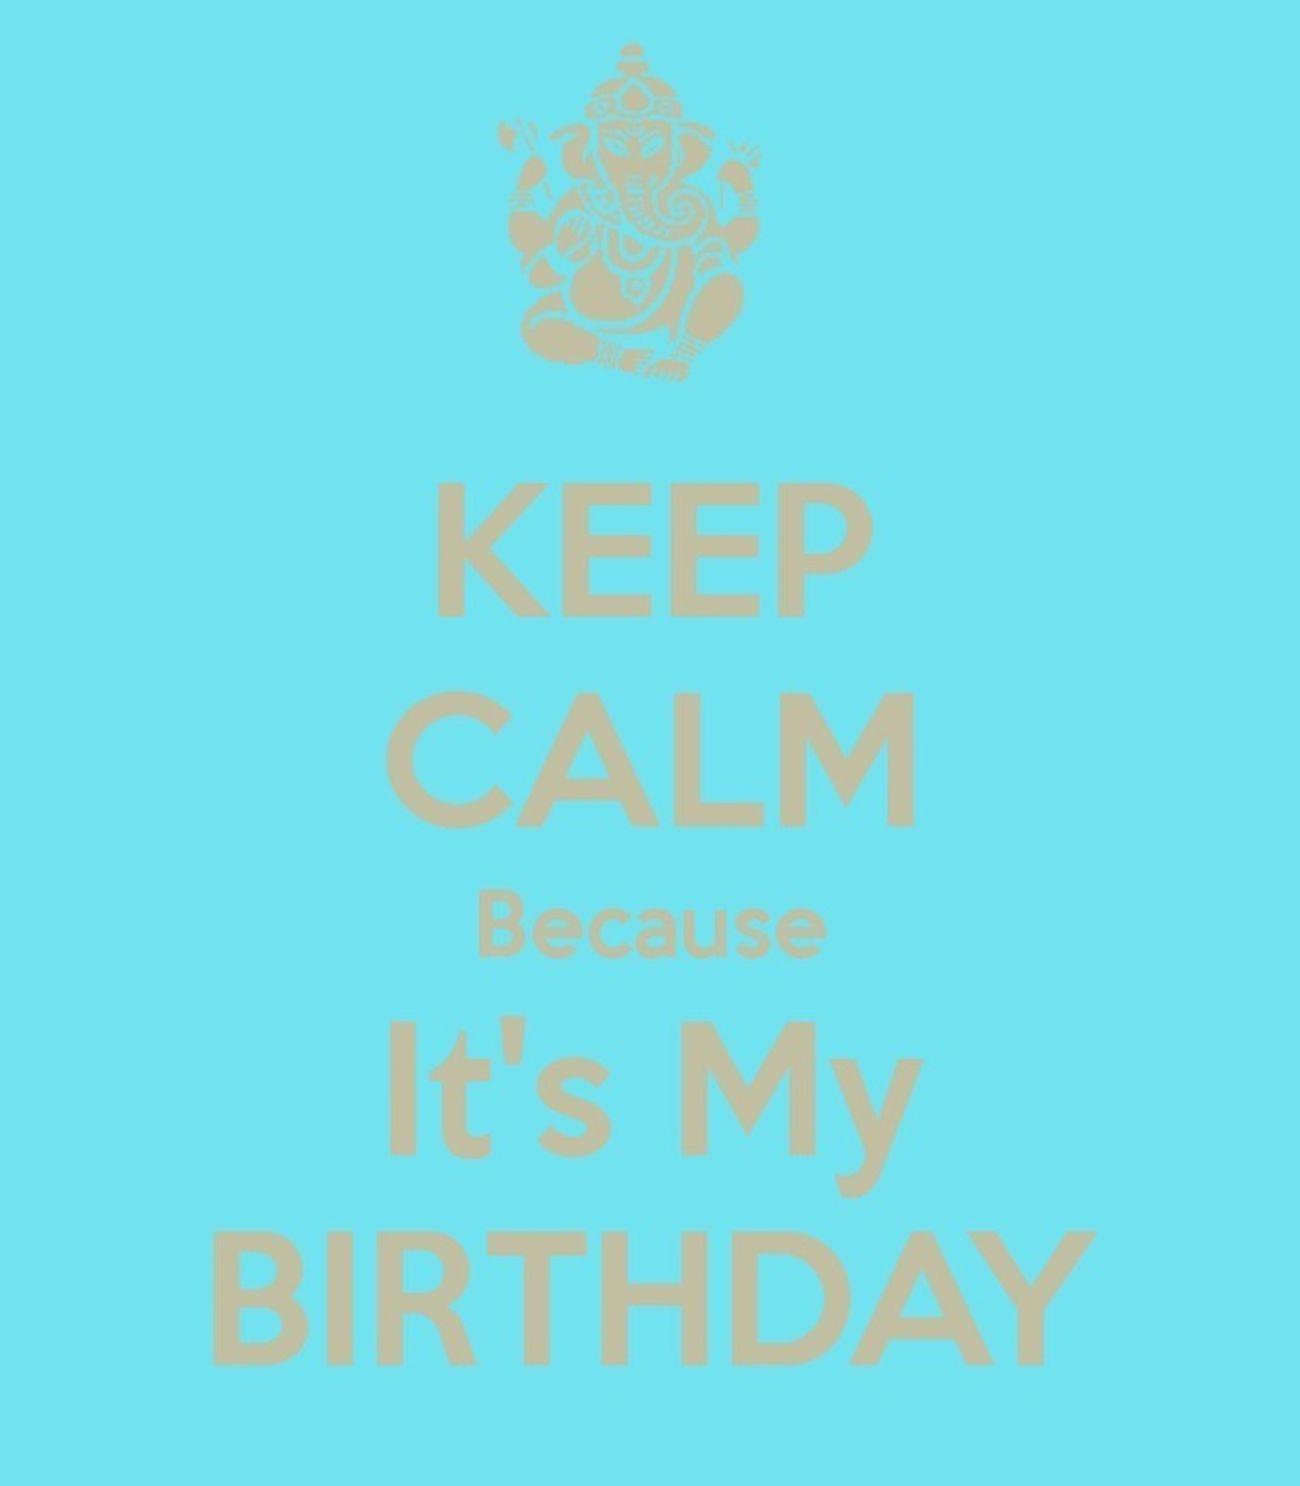 Yuuuussss Birthday Donde Estan Las Thots? Feliz Cumpleaños A Mi Fiesta Puta